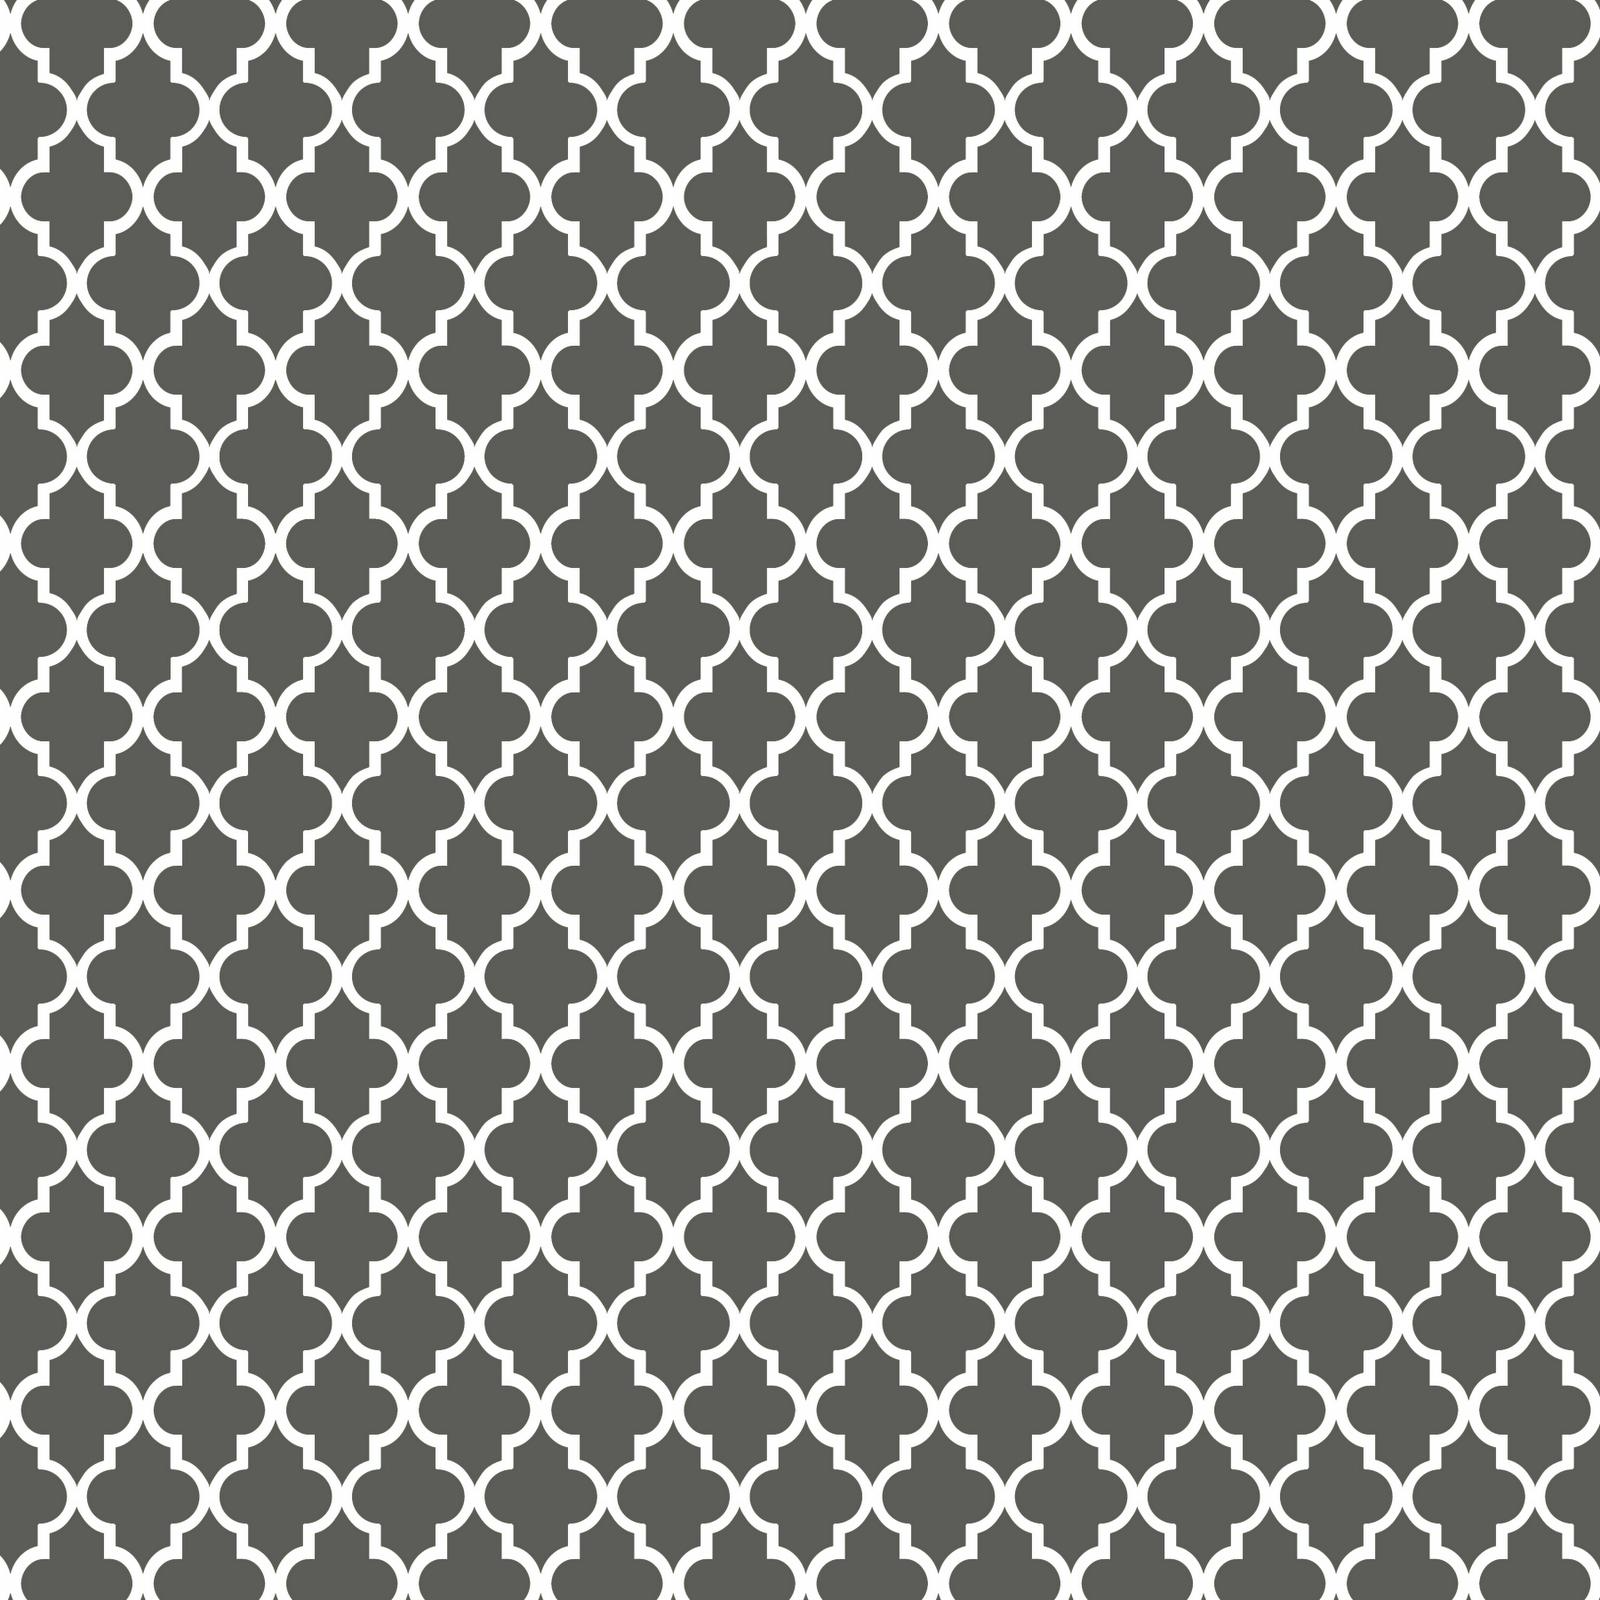 Doodle Craft: More Free Printable Patterns! | Laissez Passer Les - Free Printable Patterns